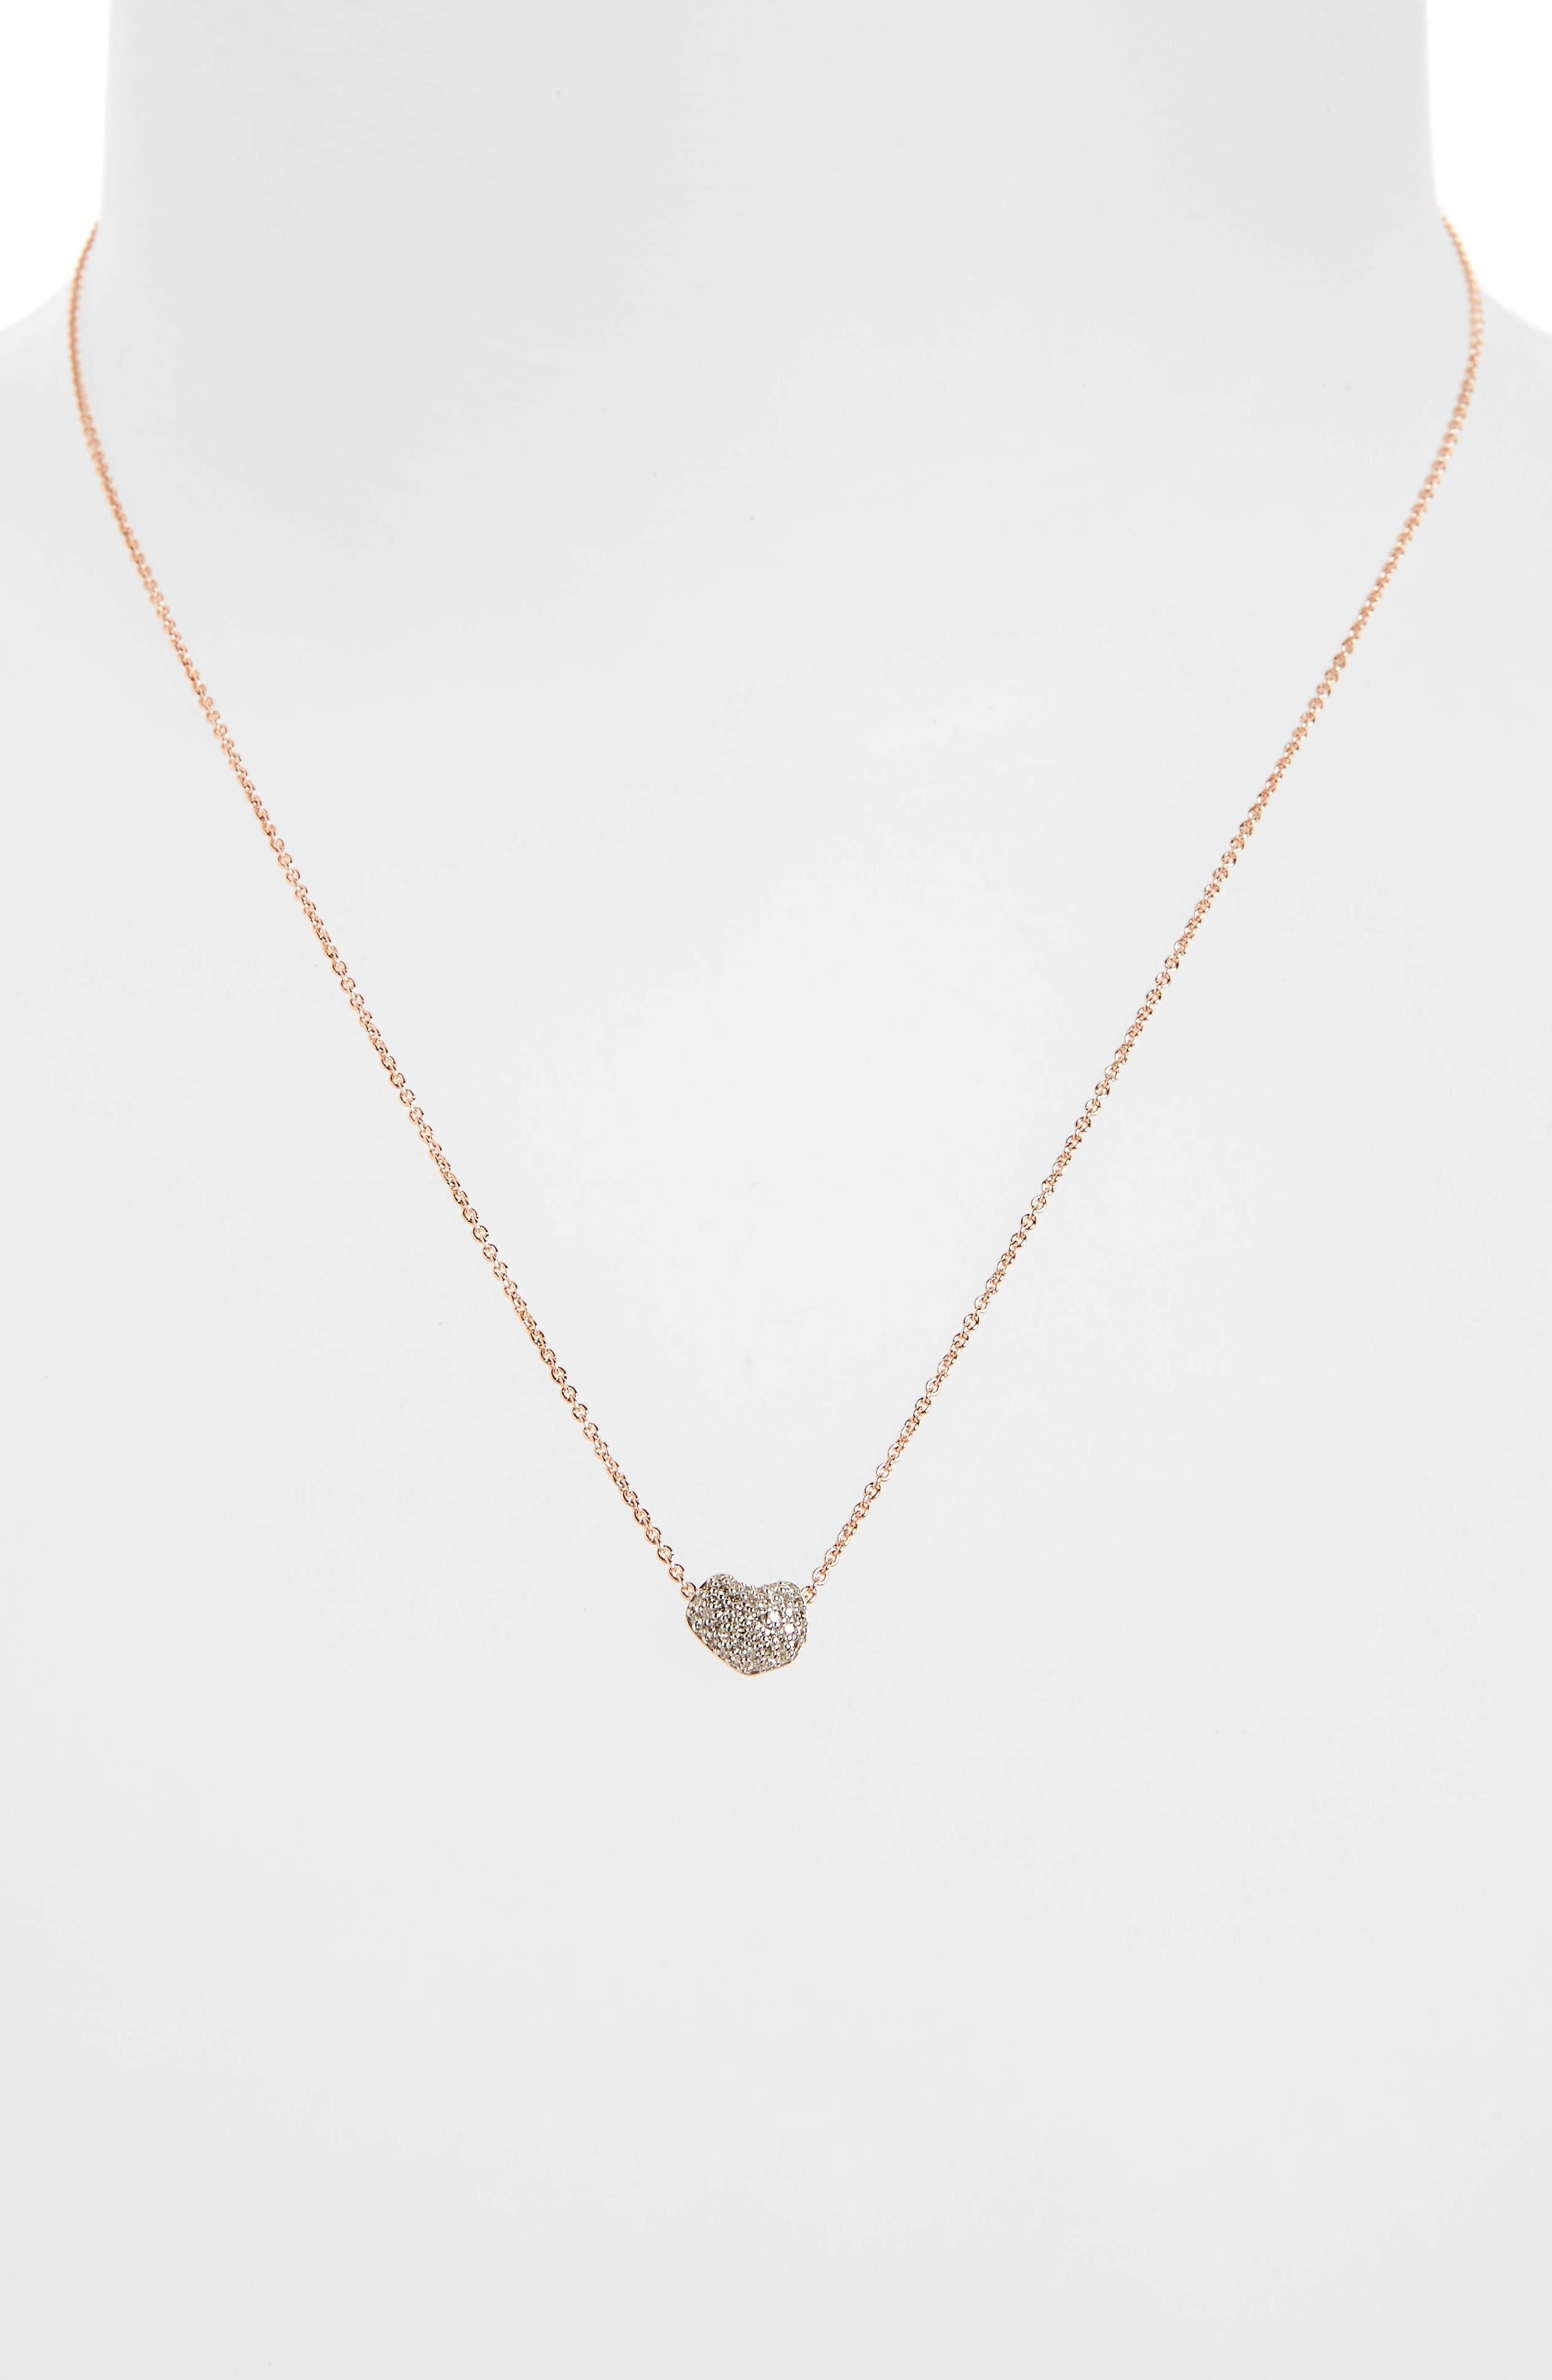 Pavé Diamond Pendant Necklace,                             Alternate thumbnail 2, color,                             ROSE GOLD/ DIAMOND